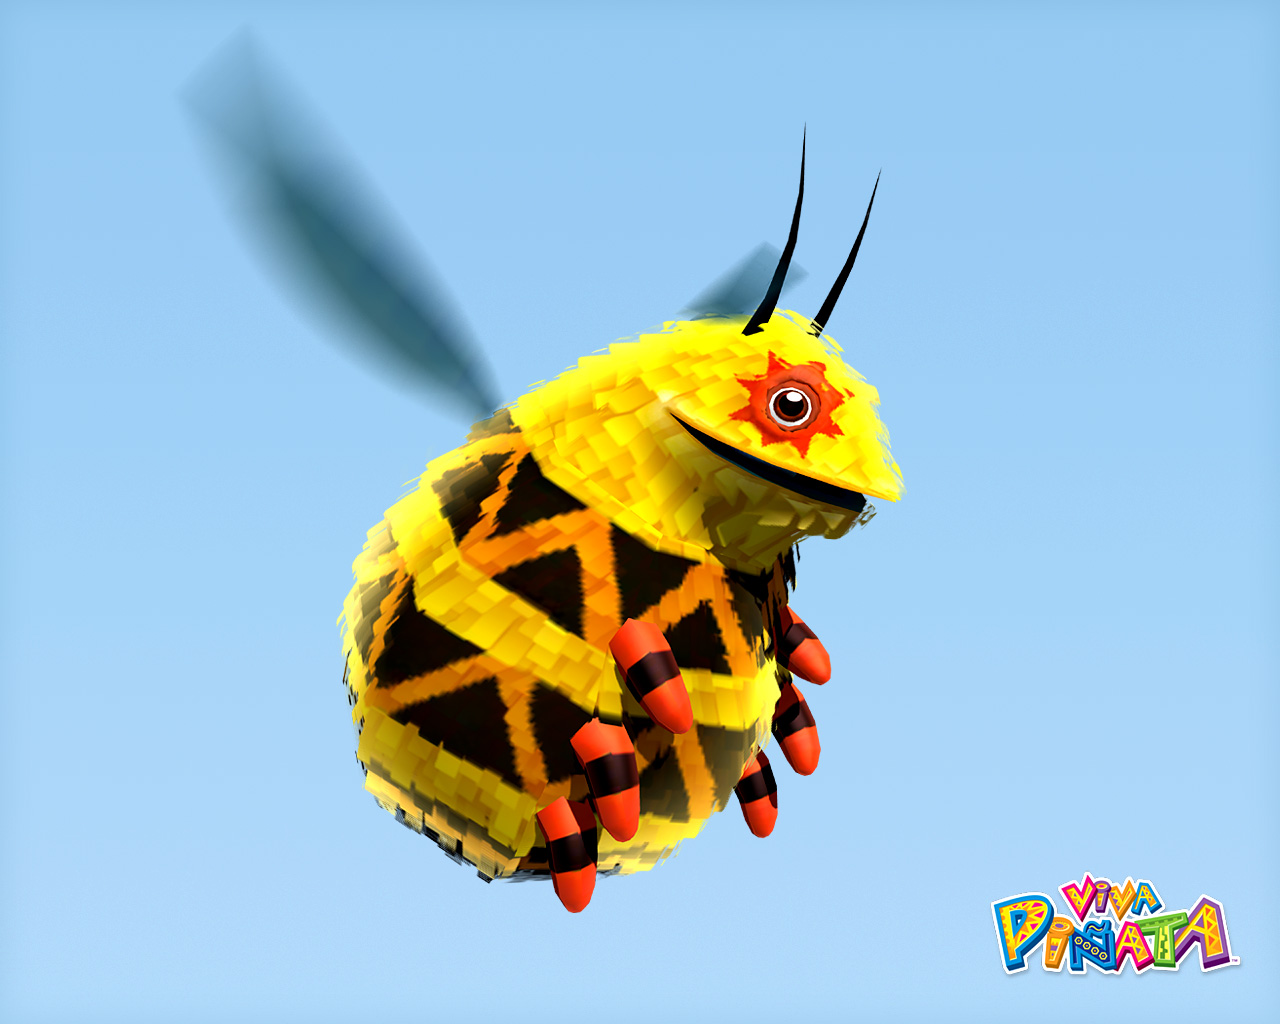 List of Viva Piñata episodes - Wikipedia